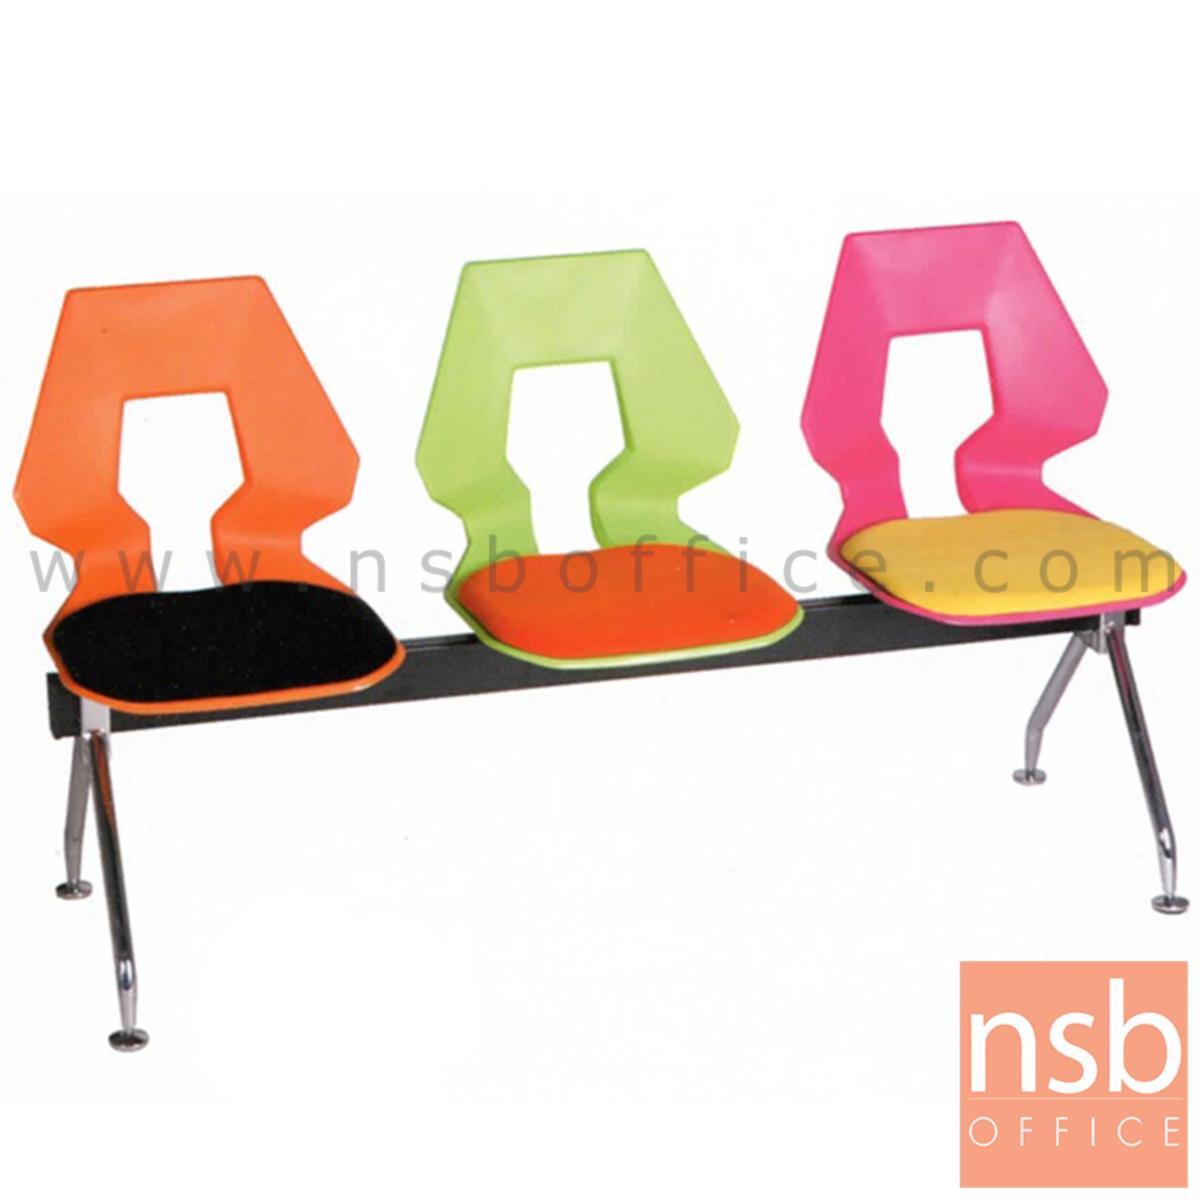 B06A086:เก้าอี้นั่งคอยเฟรมโพลี่หุ้มเบาะ รุ่น Neverland (เนเวอร์แลนด์) 2 ,3 ,4 ที่นั่ง ขนาด 92W ,143W ,194W cm. ขาเหล็ก